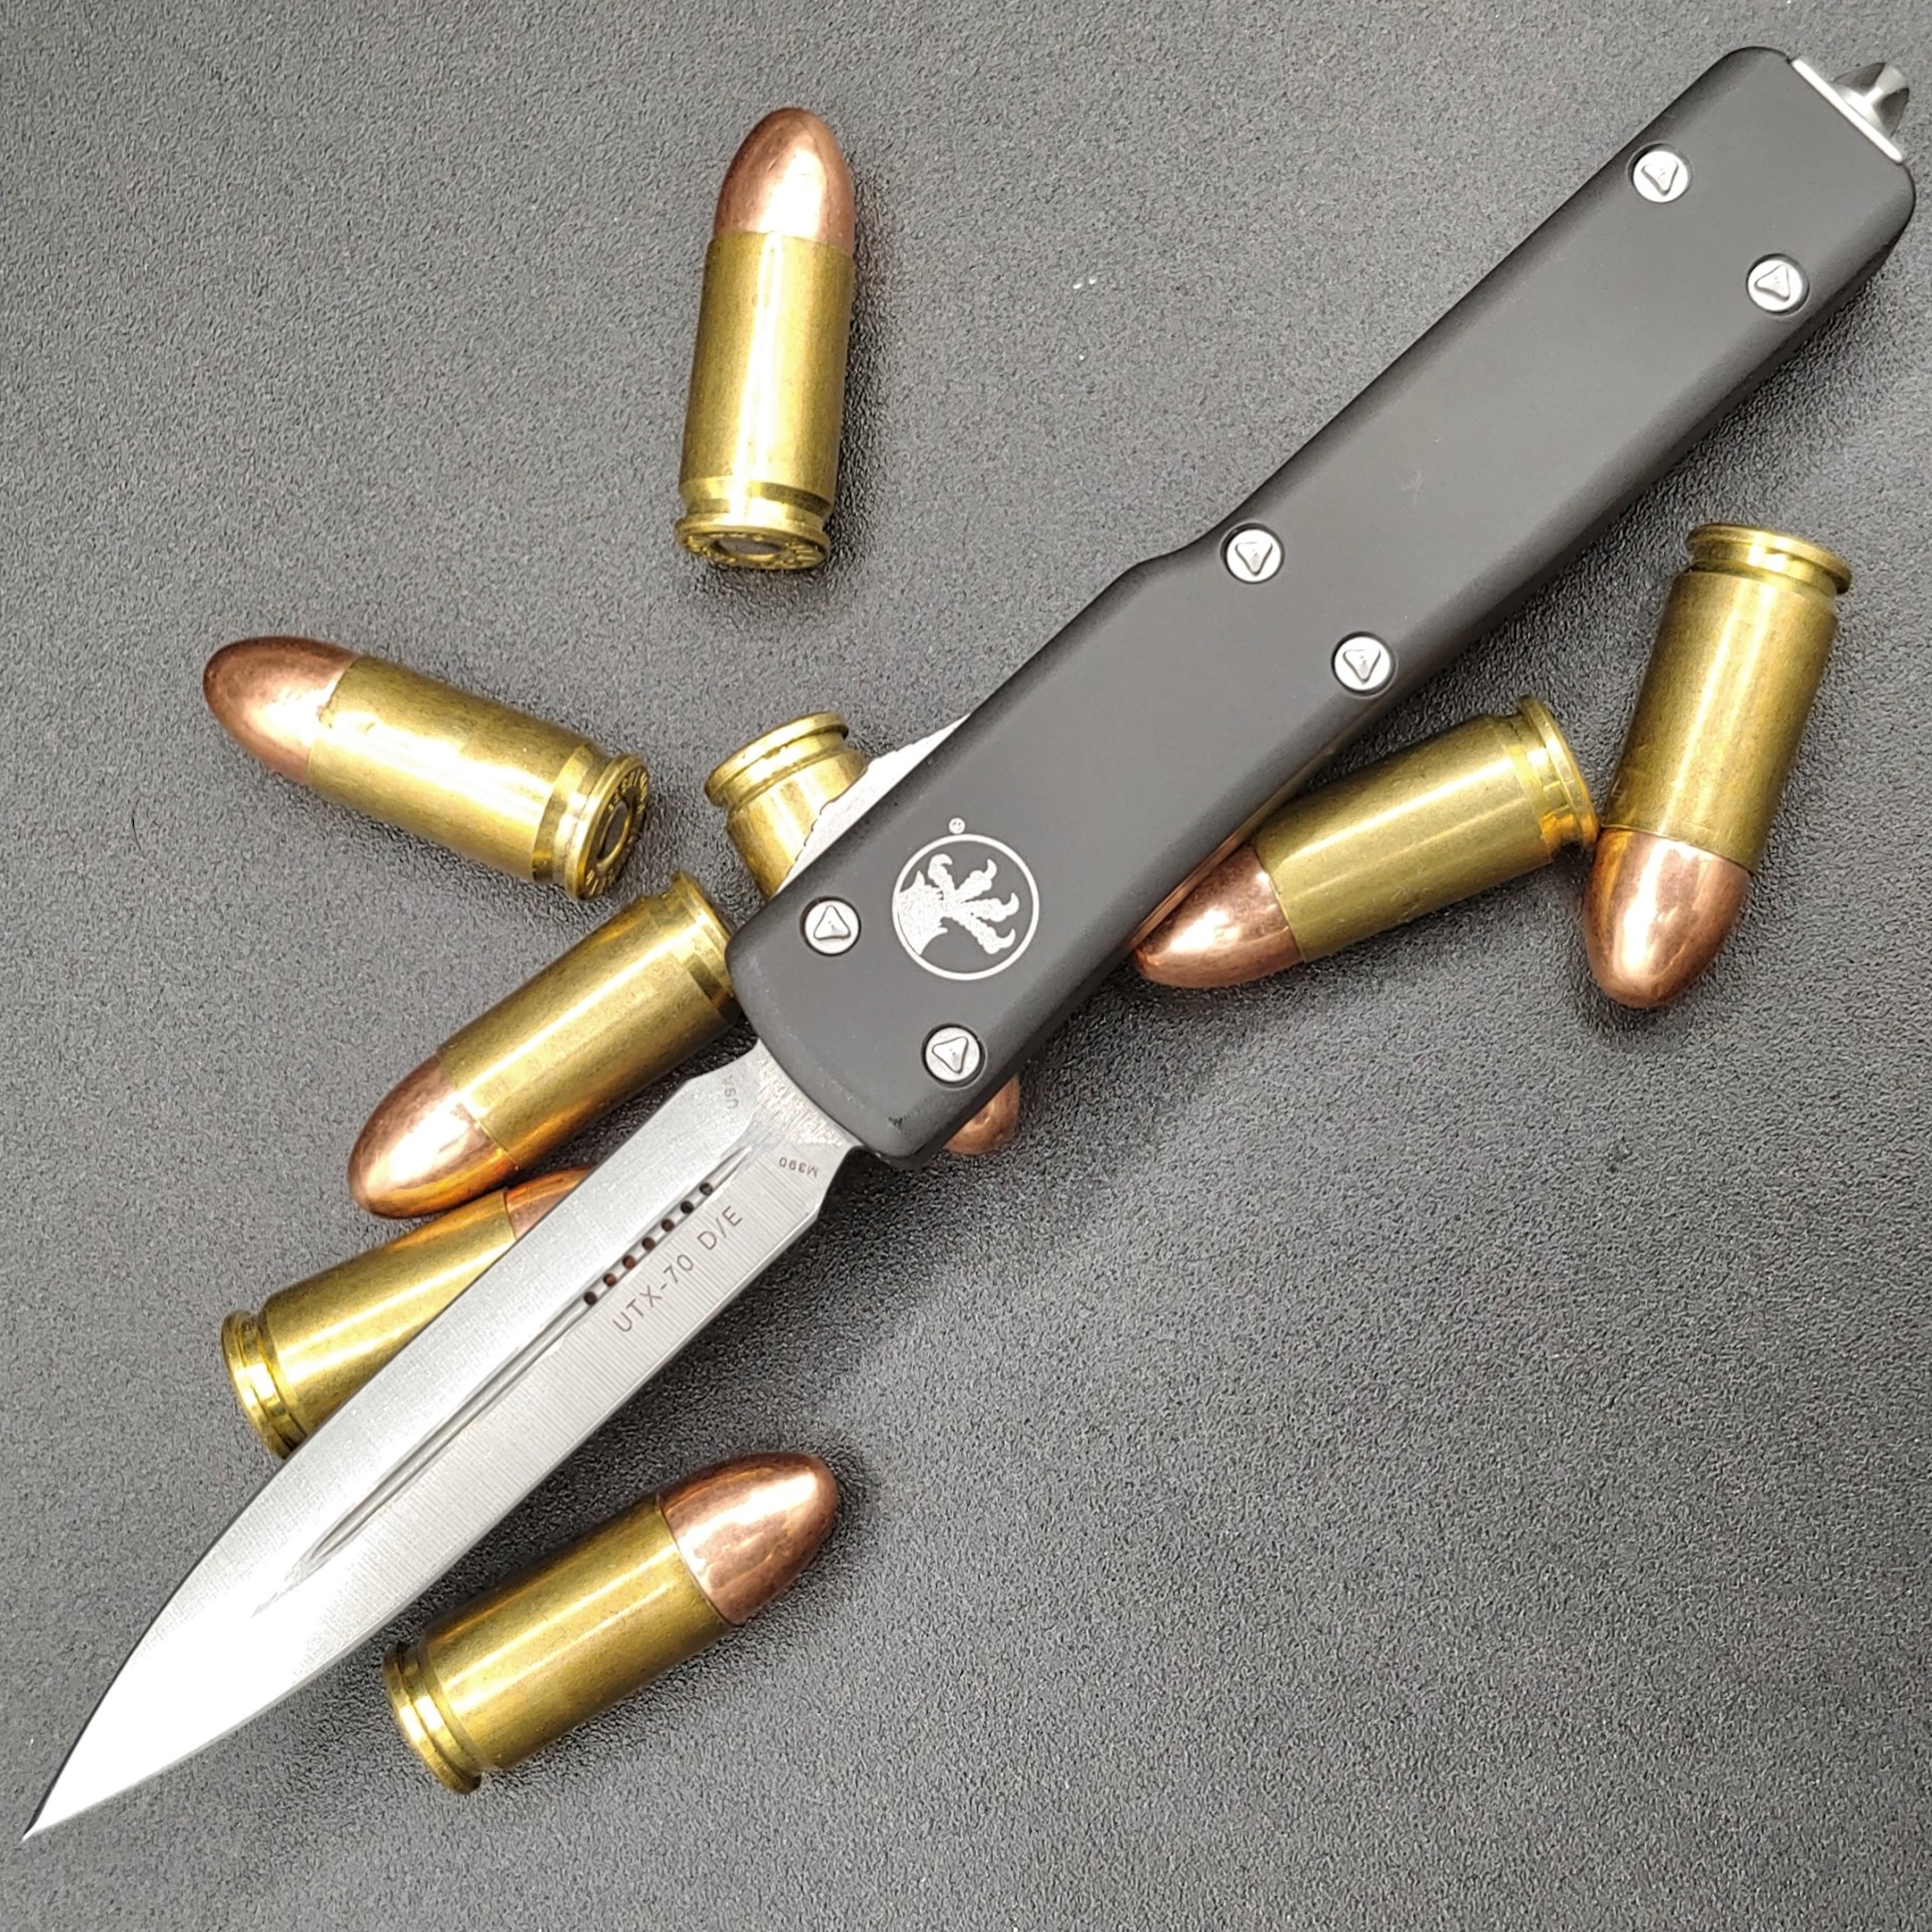 Microtech UTX-70, blade - double edge apocalyptic